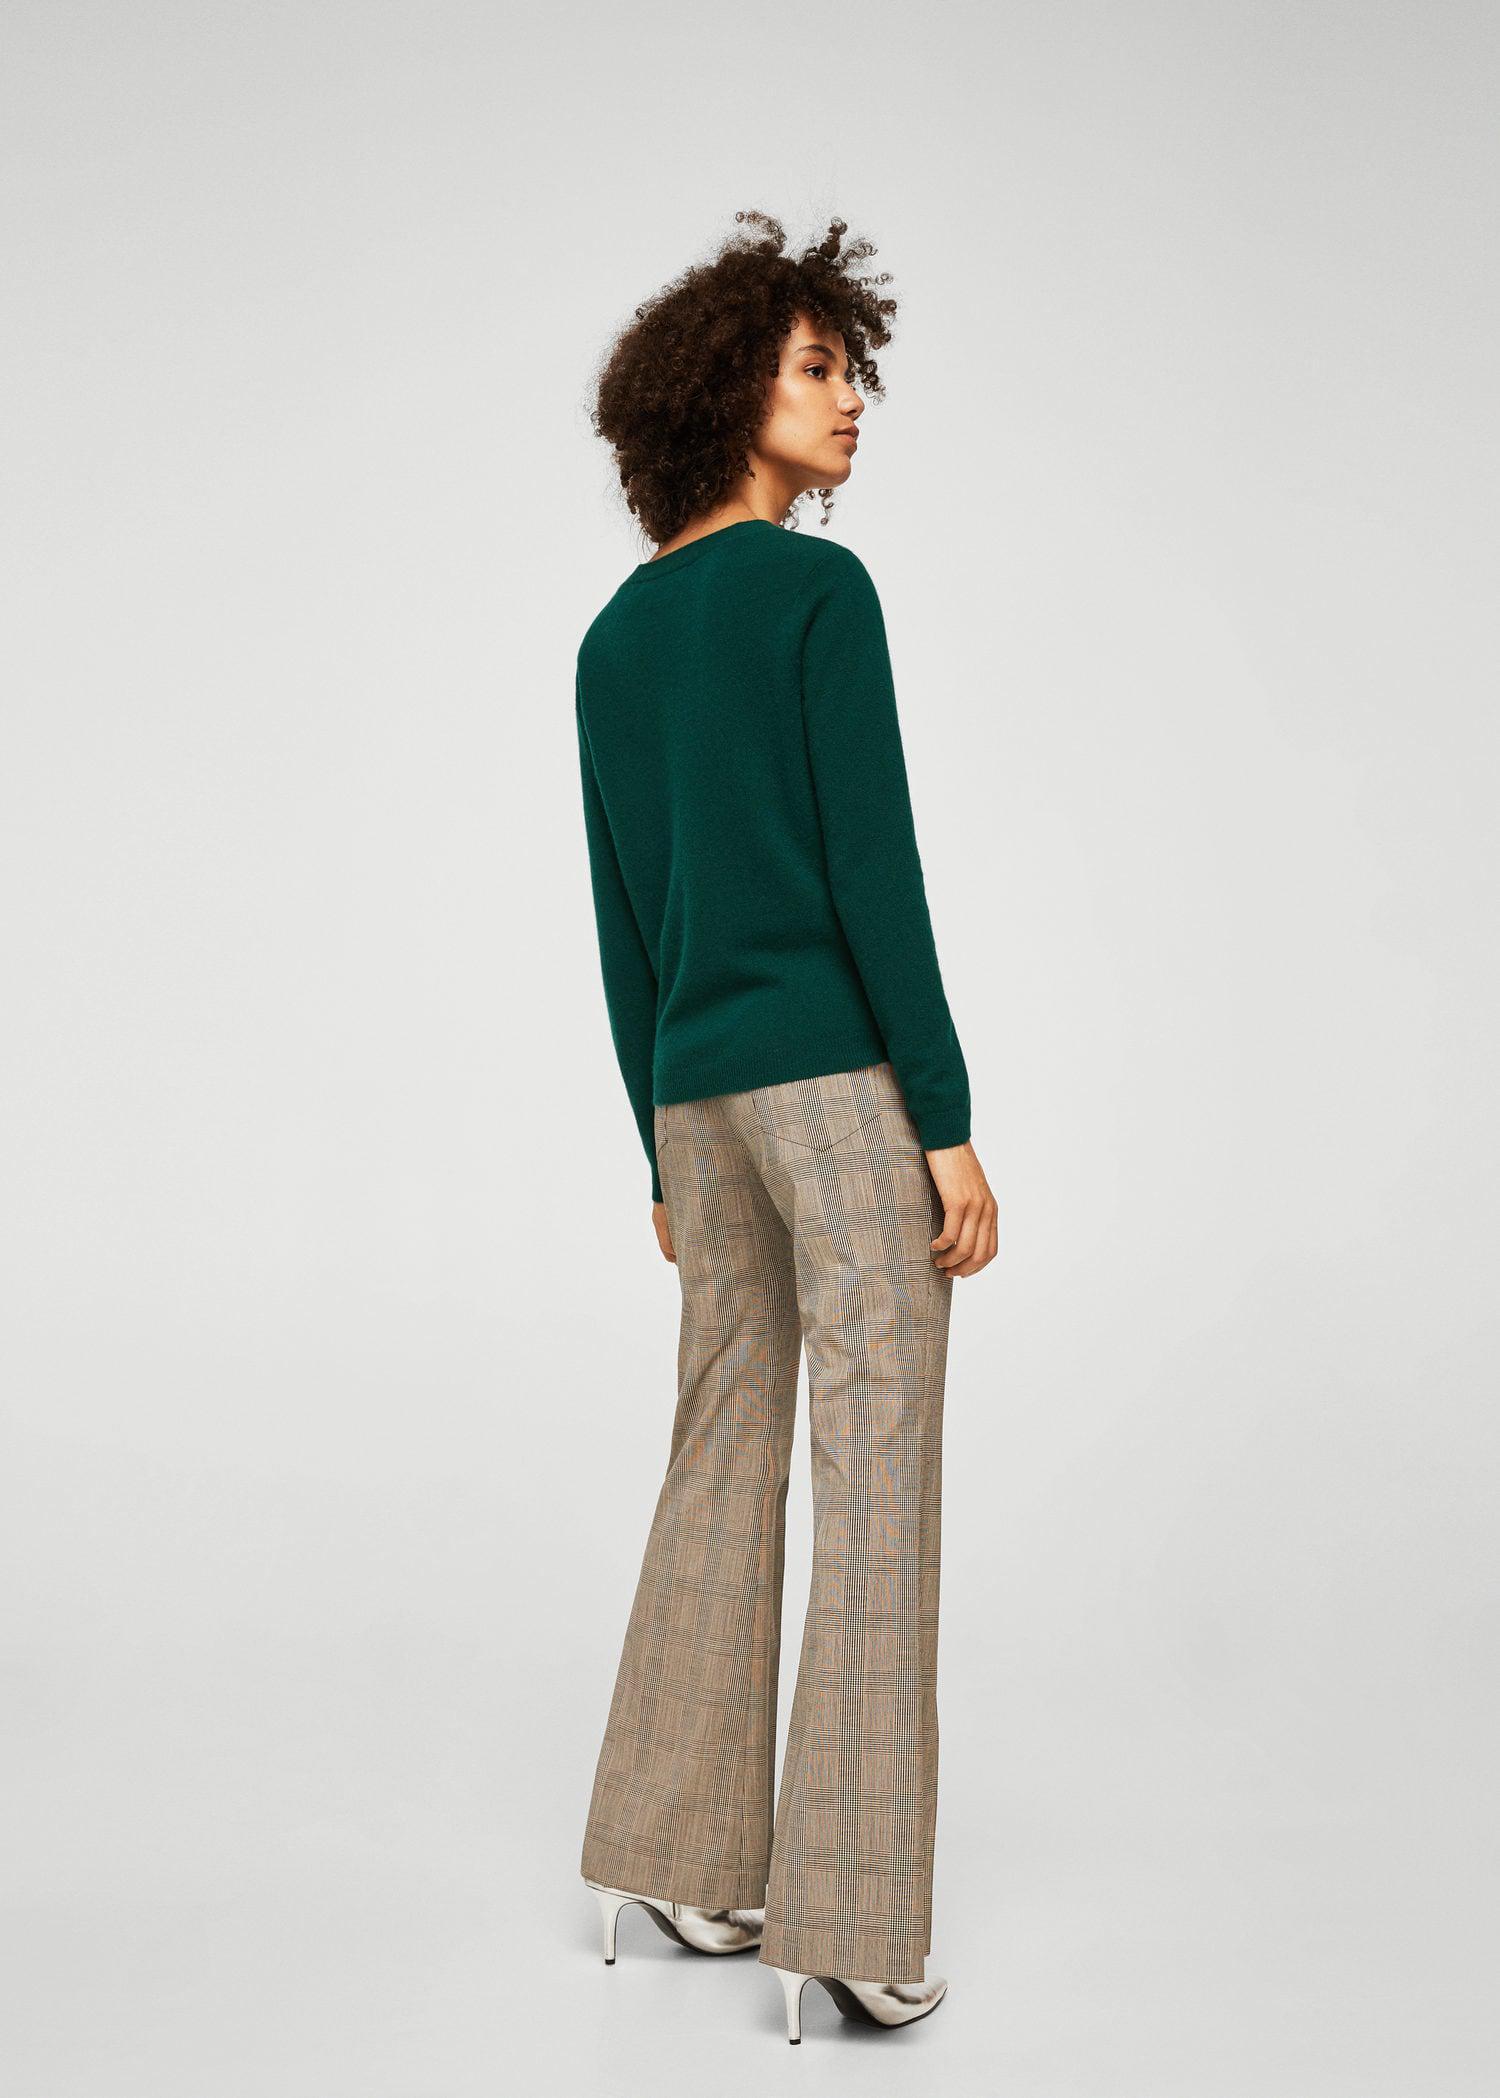 Mango V-neck Cashmere Sweater in Dark Green (Green) for Men